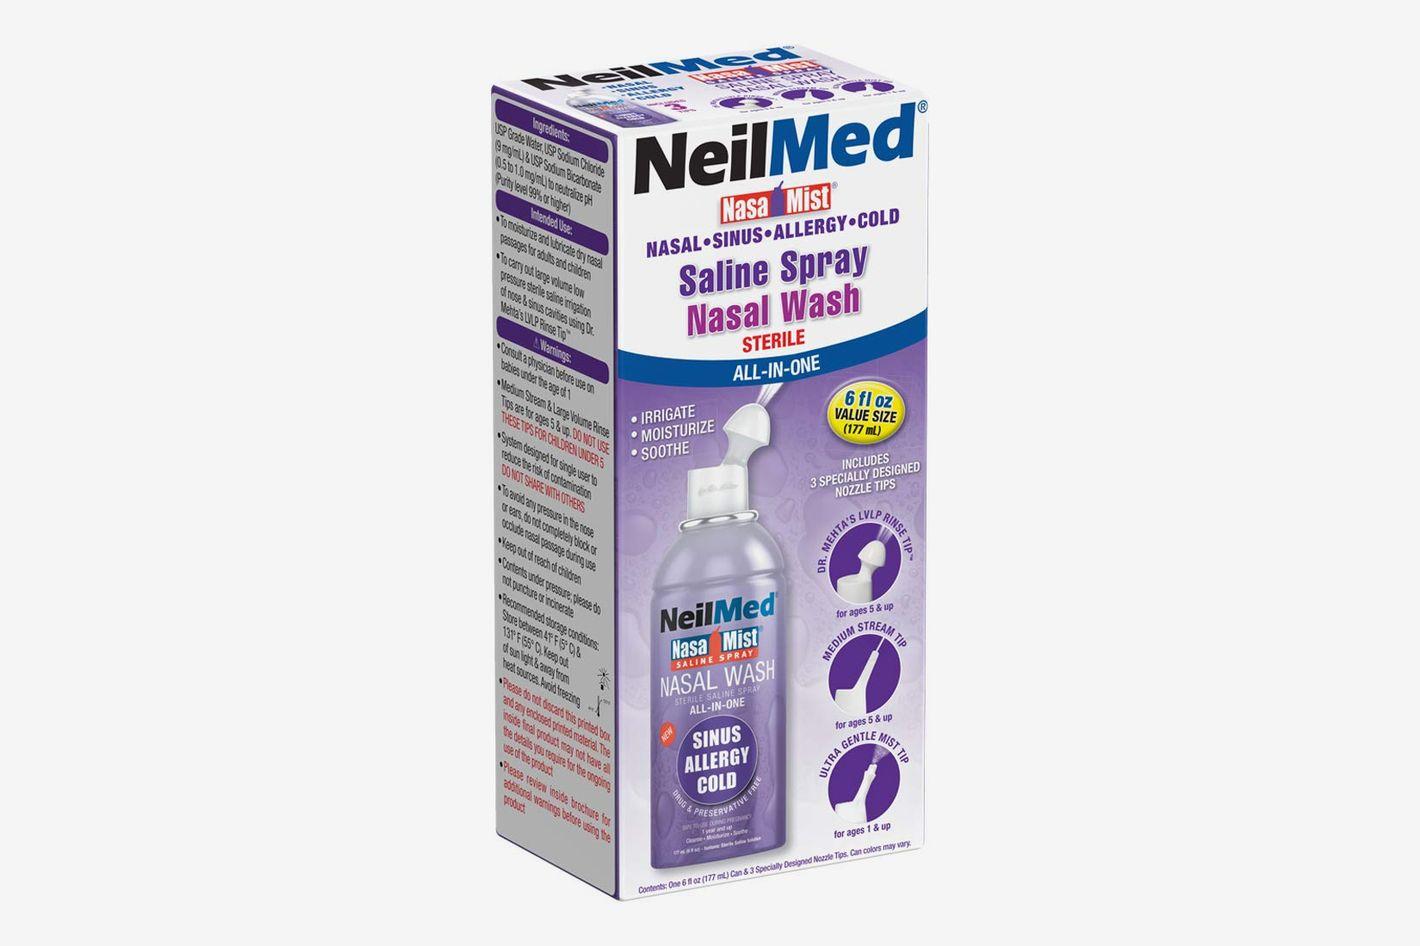 NeilMed Nasa Mist Multi-Purpose Saline Spray All in One